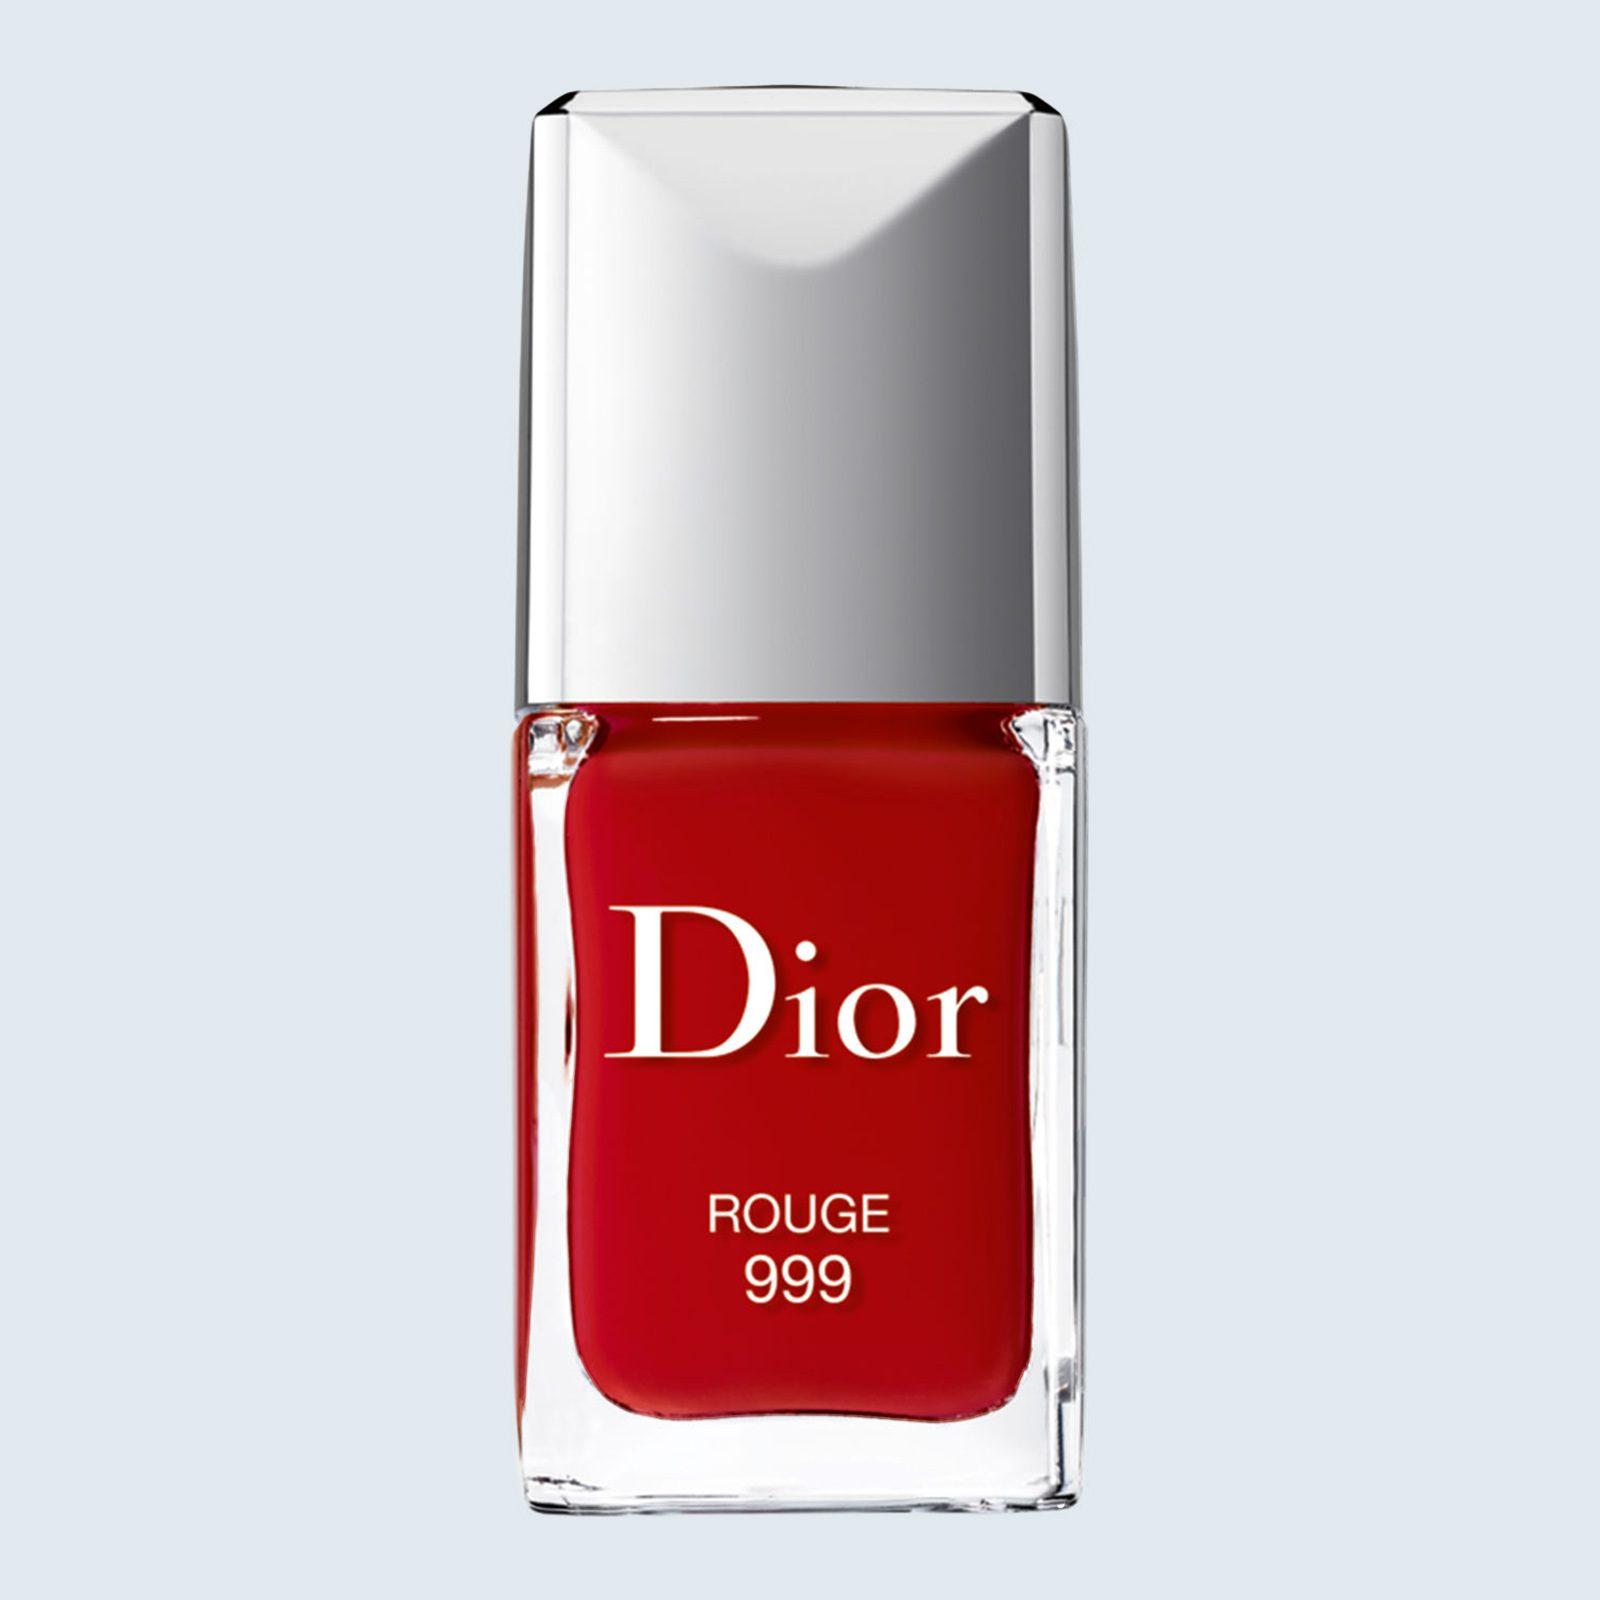 Dior Vernis Gel Shine Long-Wear Nail Lacquer